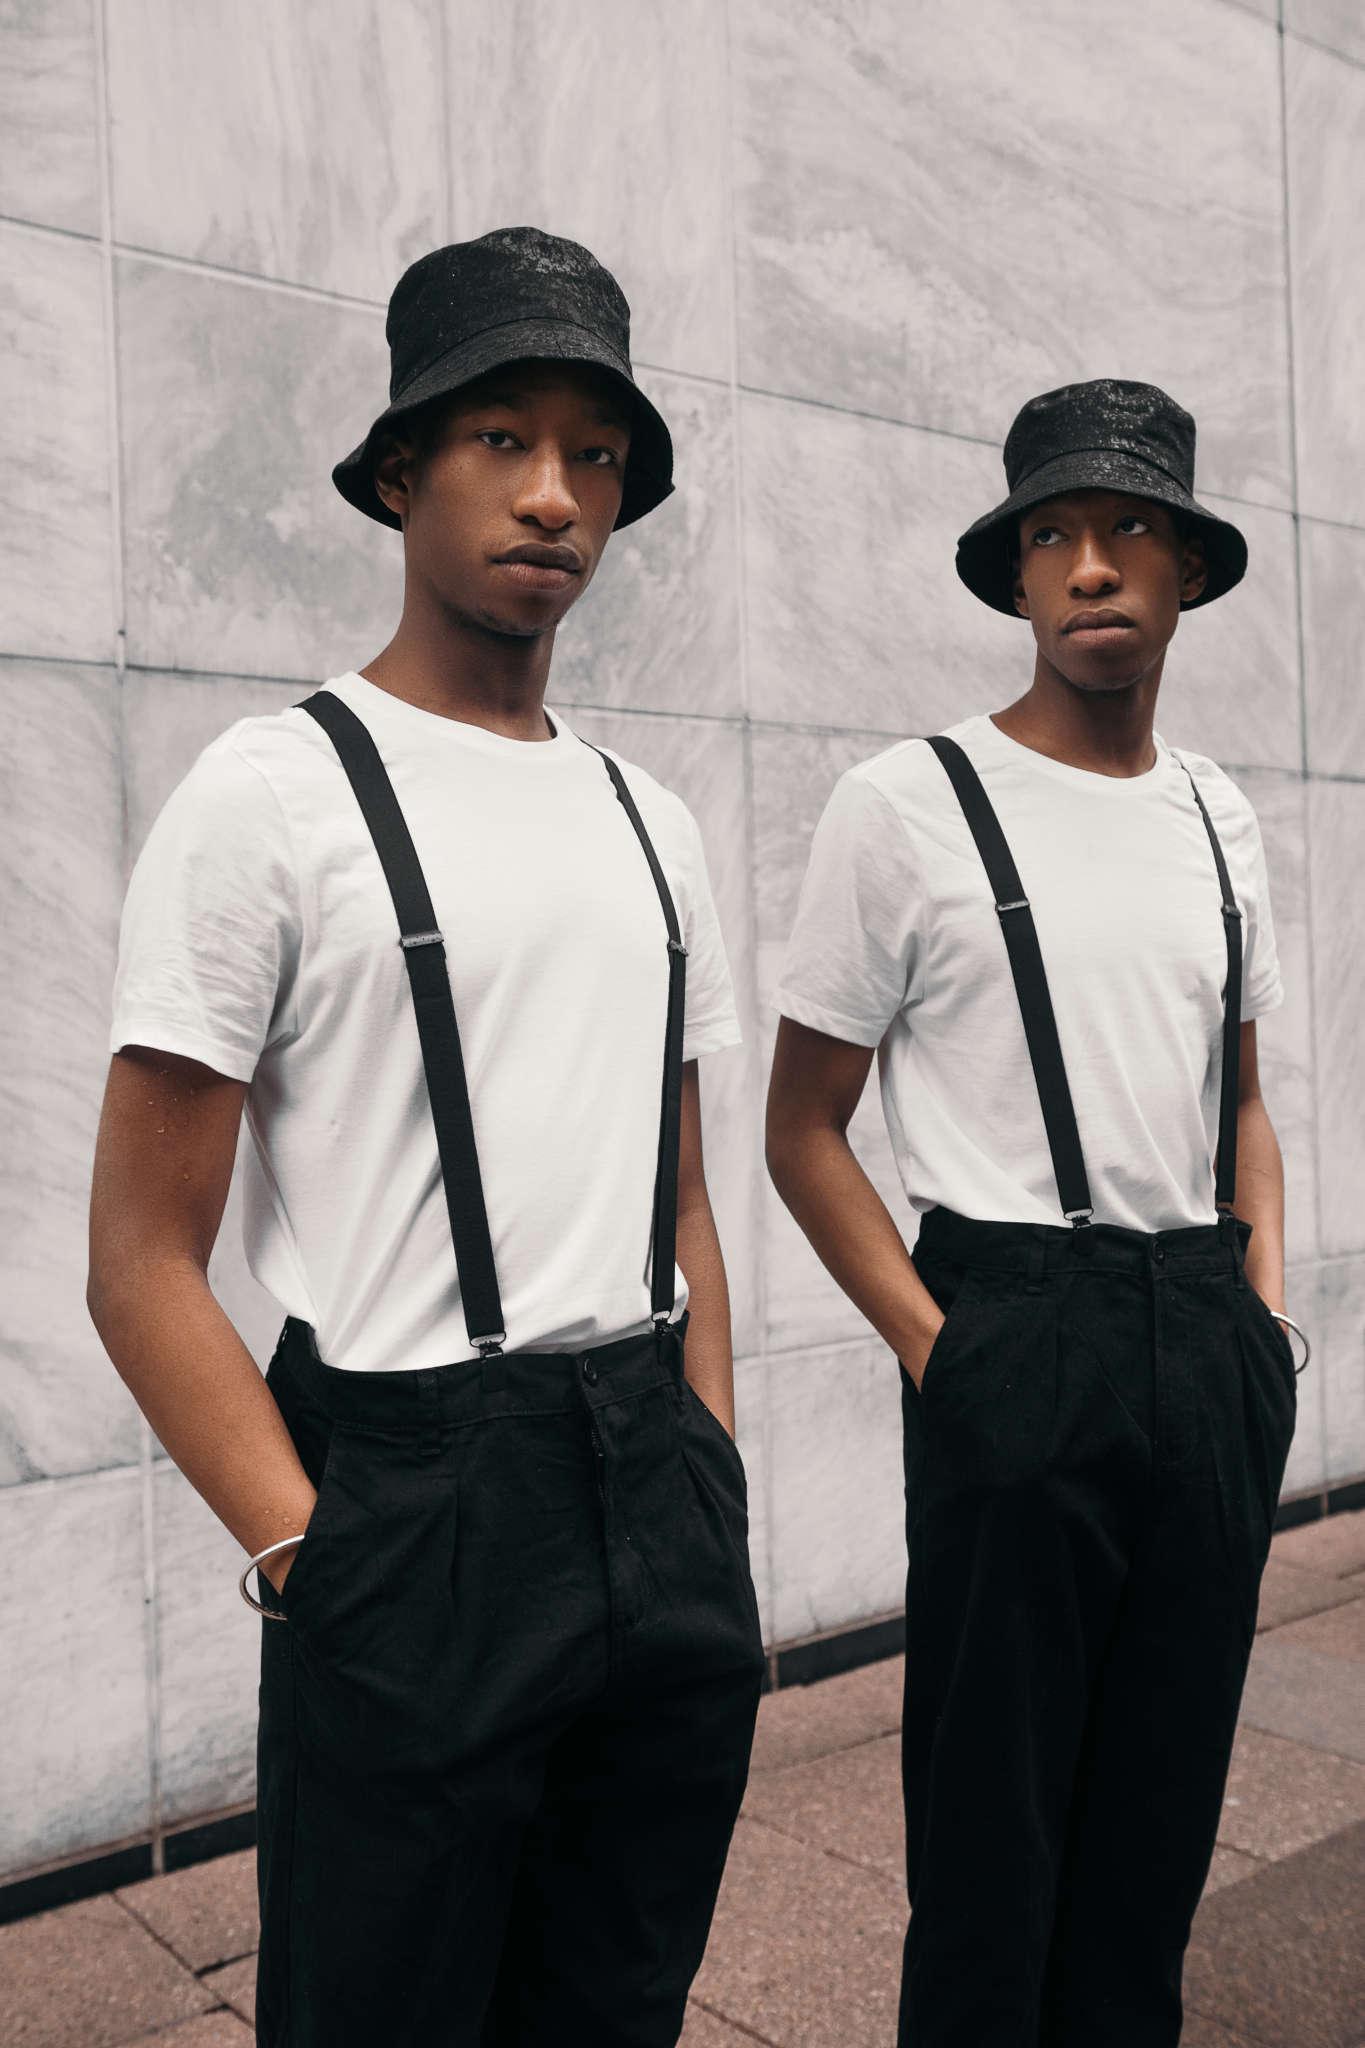 Dijon and Devontay wear Atika London hats, Sunspel t-shirts, Hugo Boss trouses, Charles Tyrwhitt braces, Eleventy socks, Base London shoes, model's own jewellery